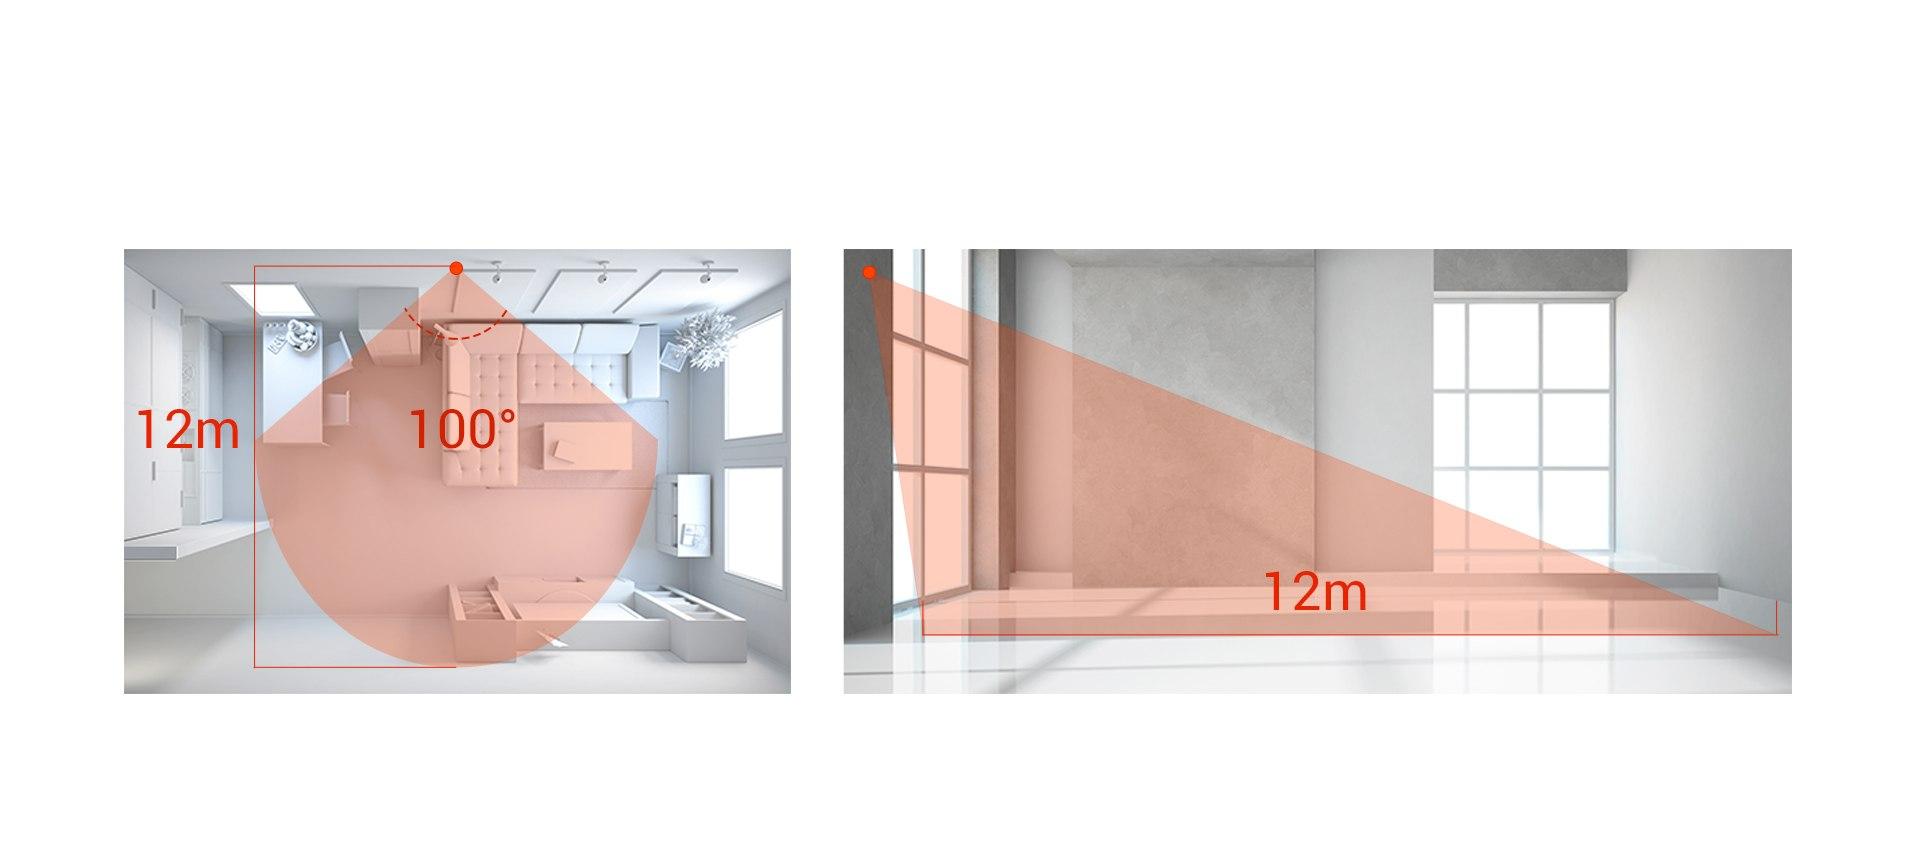 T1 - EZVIZ Wireless PIR Motion Detector